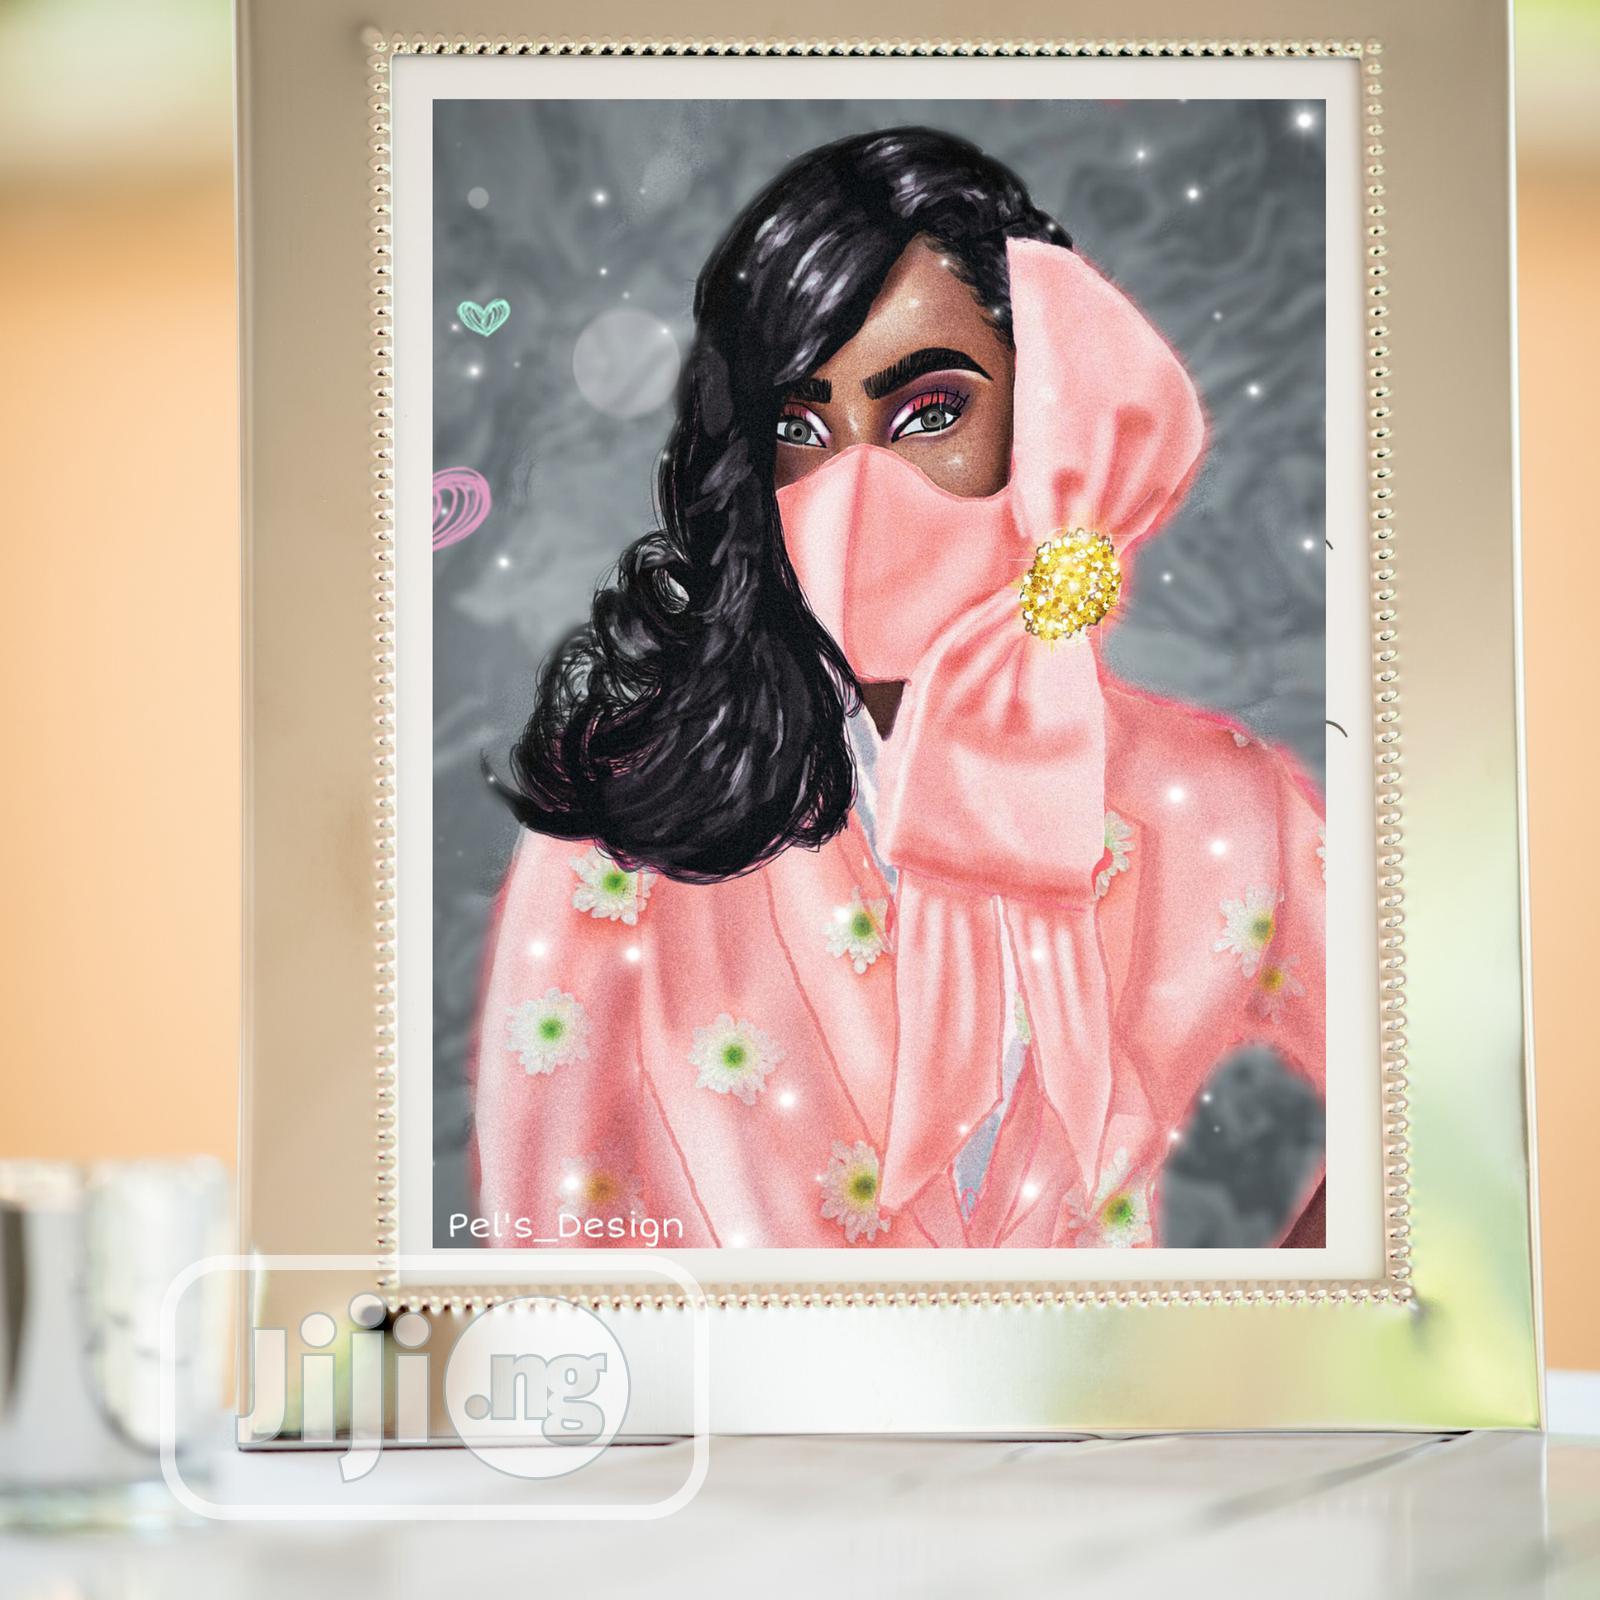 Archive: Digital Portrait Art & Fashion Illustrations.